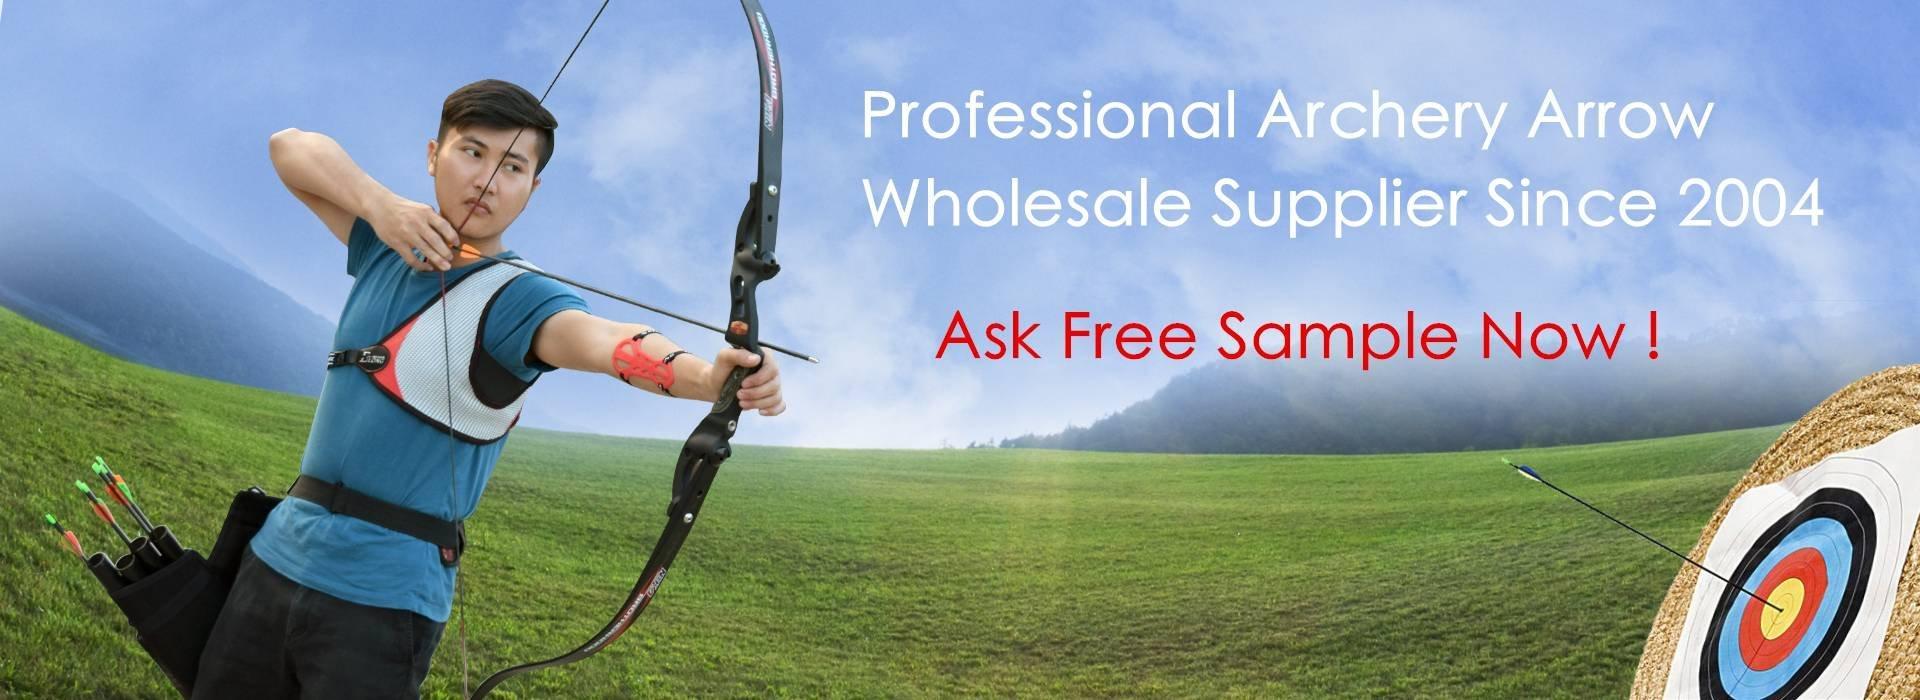 Professional Archery Arrow Wholesale Supplier Since 2004